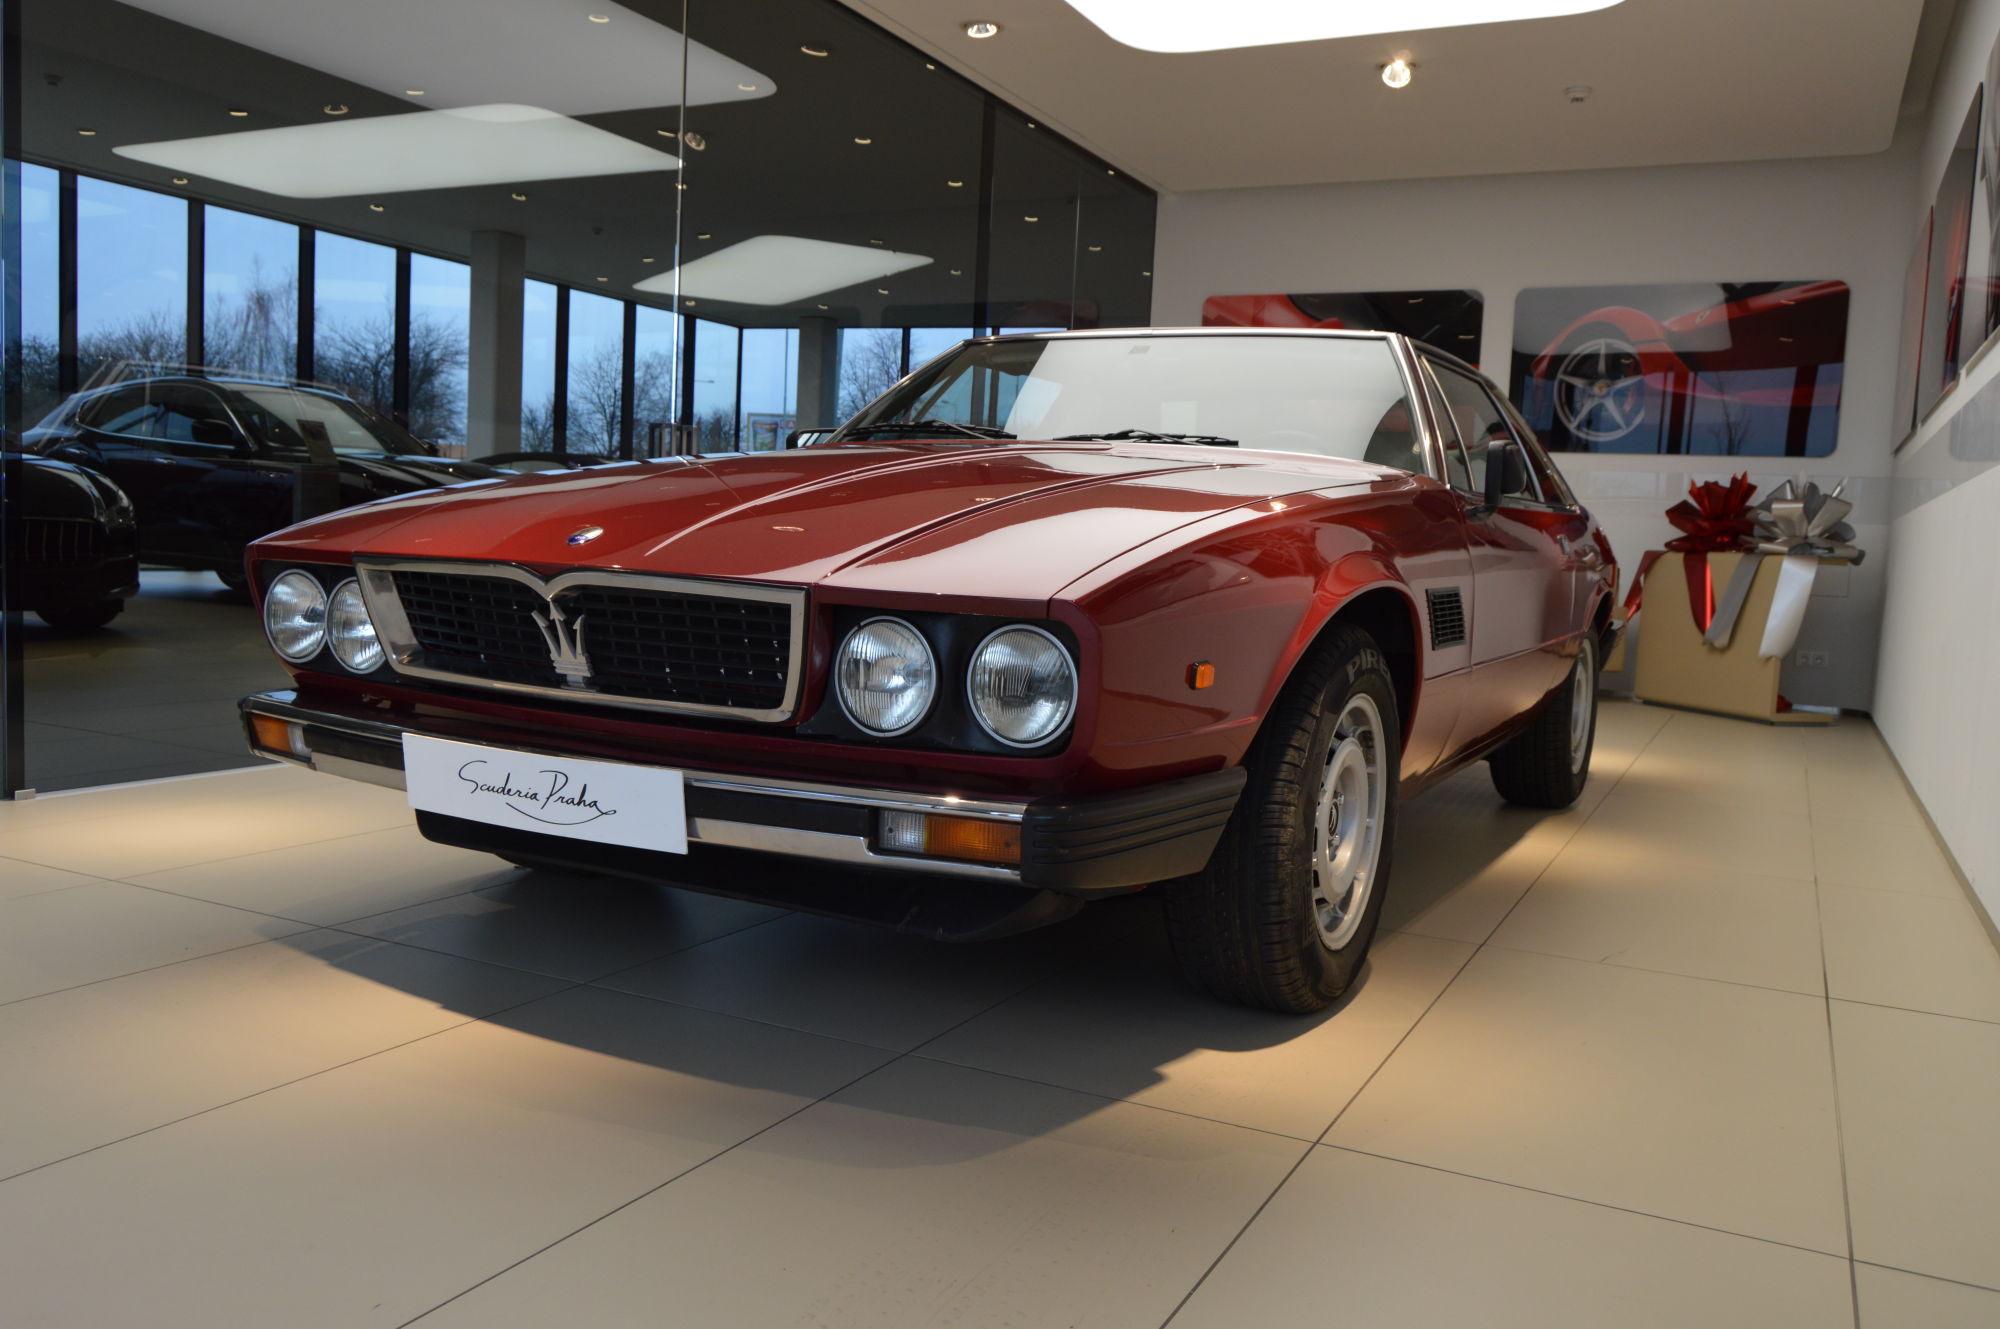 Maserati Kyalami - Scuderia Praha